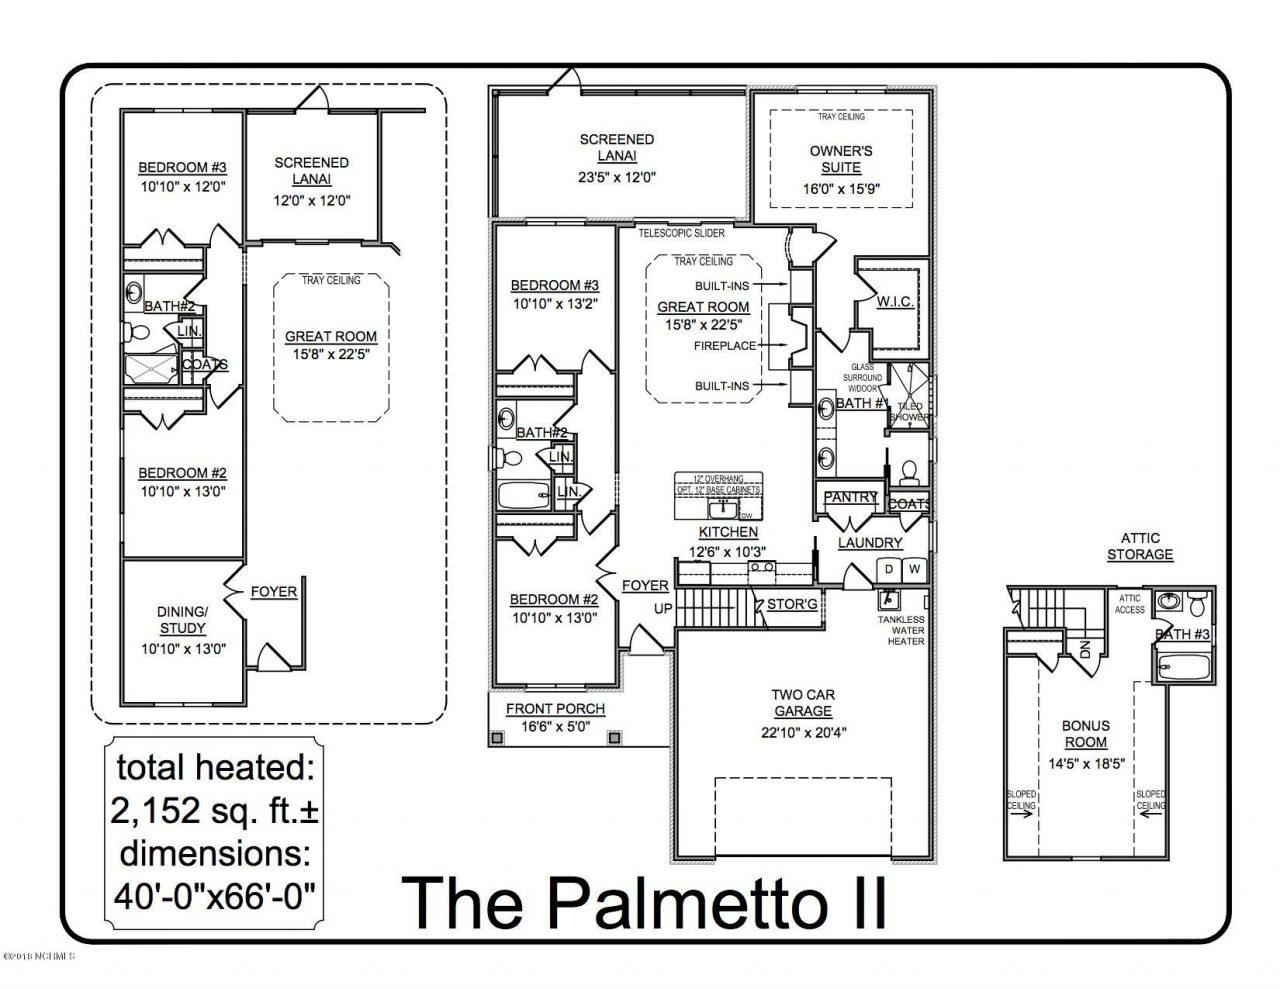 Palmetto II Cutsheet (3)